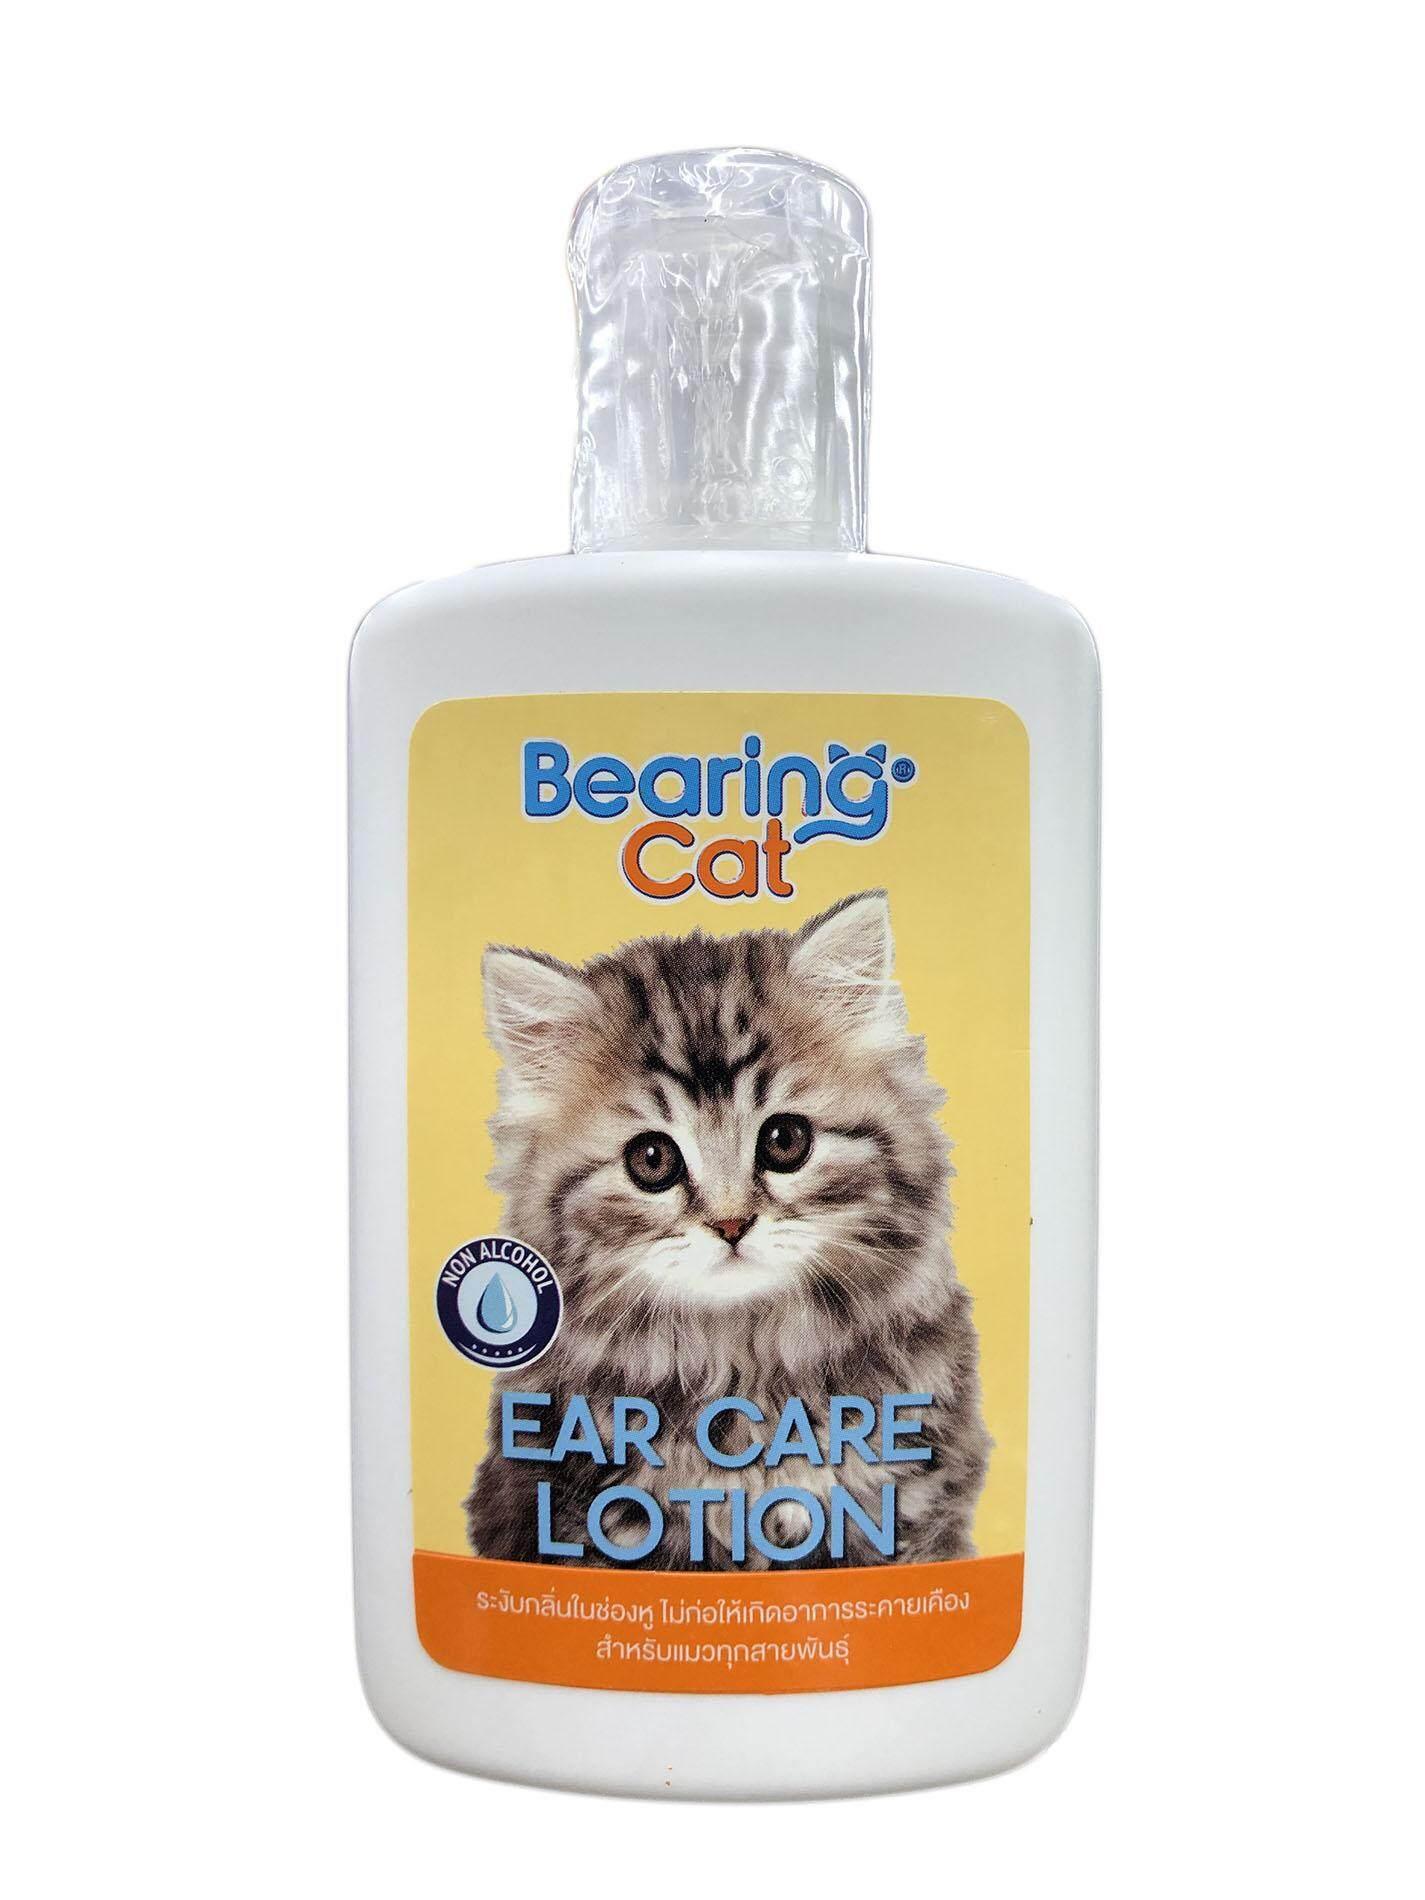 Bearing Cat Eat Care Lotion For Cat โลชั่นทำความสะอาดหูสำหรับแมว ขนาด100มล.((ของแท้100%))พร้อมส่ง!!! By Npk.online Shop.